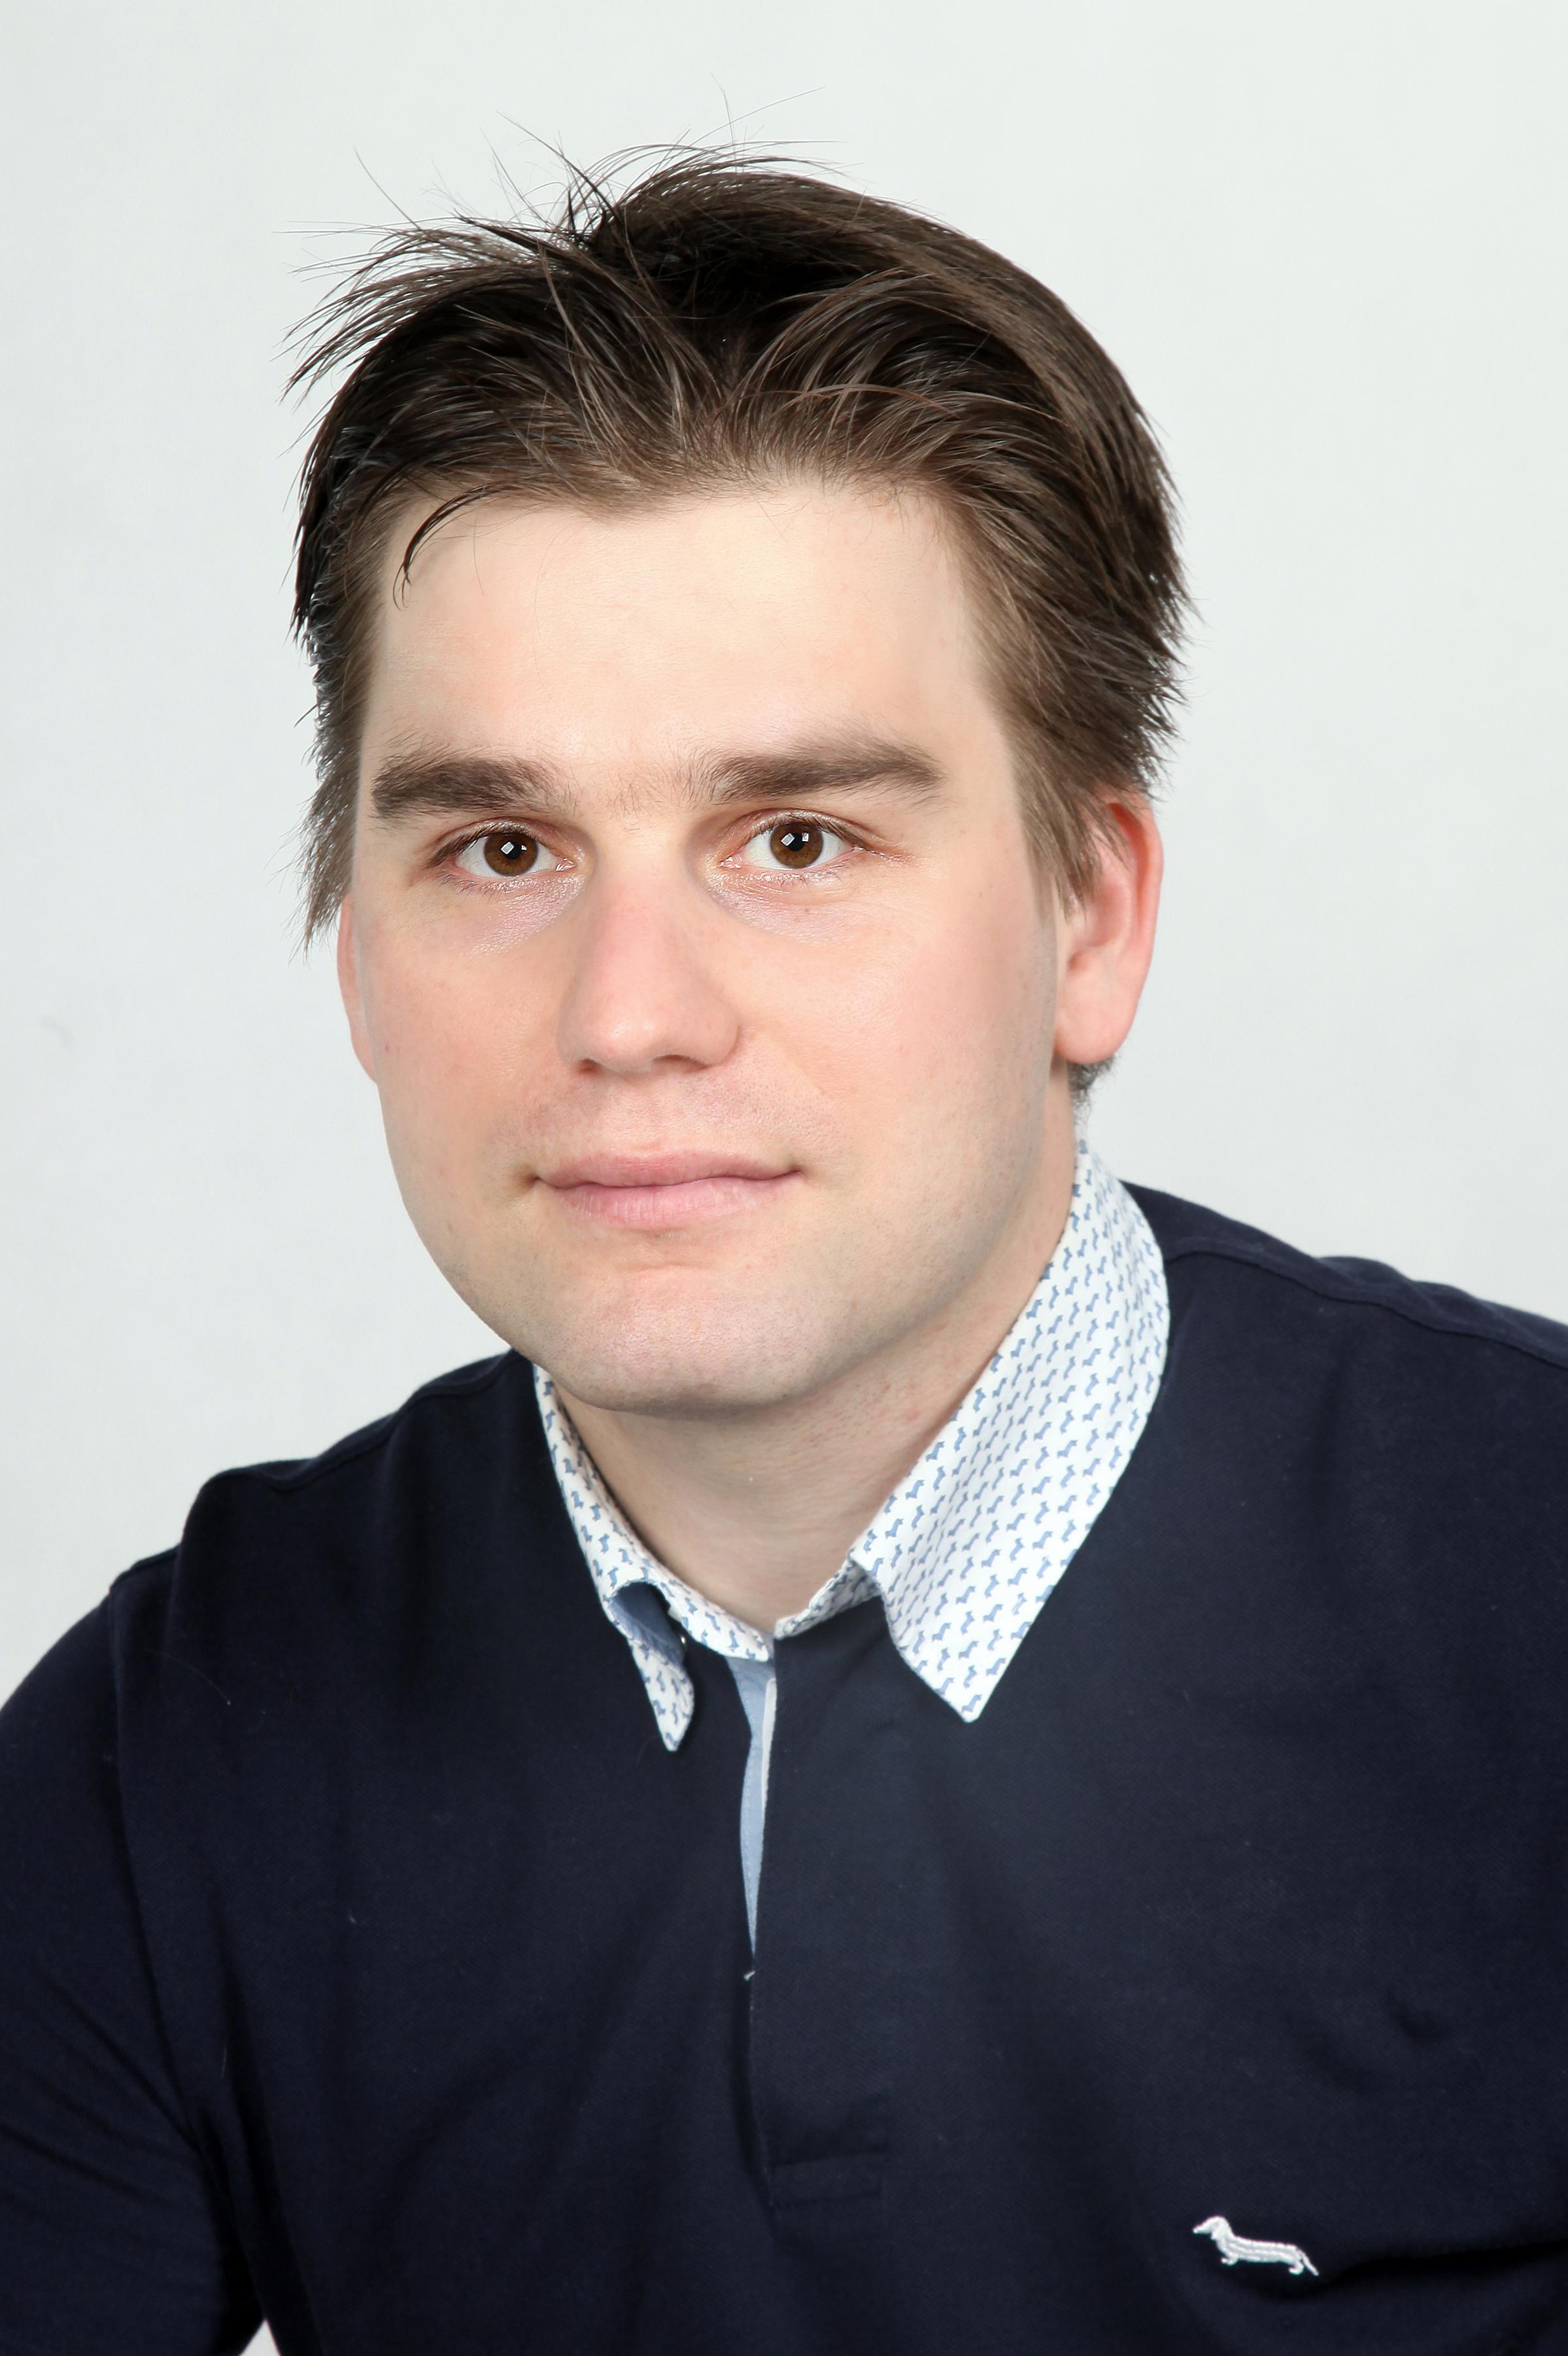 MUDr. Martin Gábor, Ph.D.